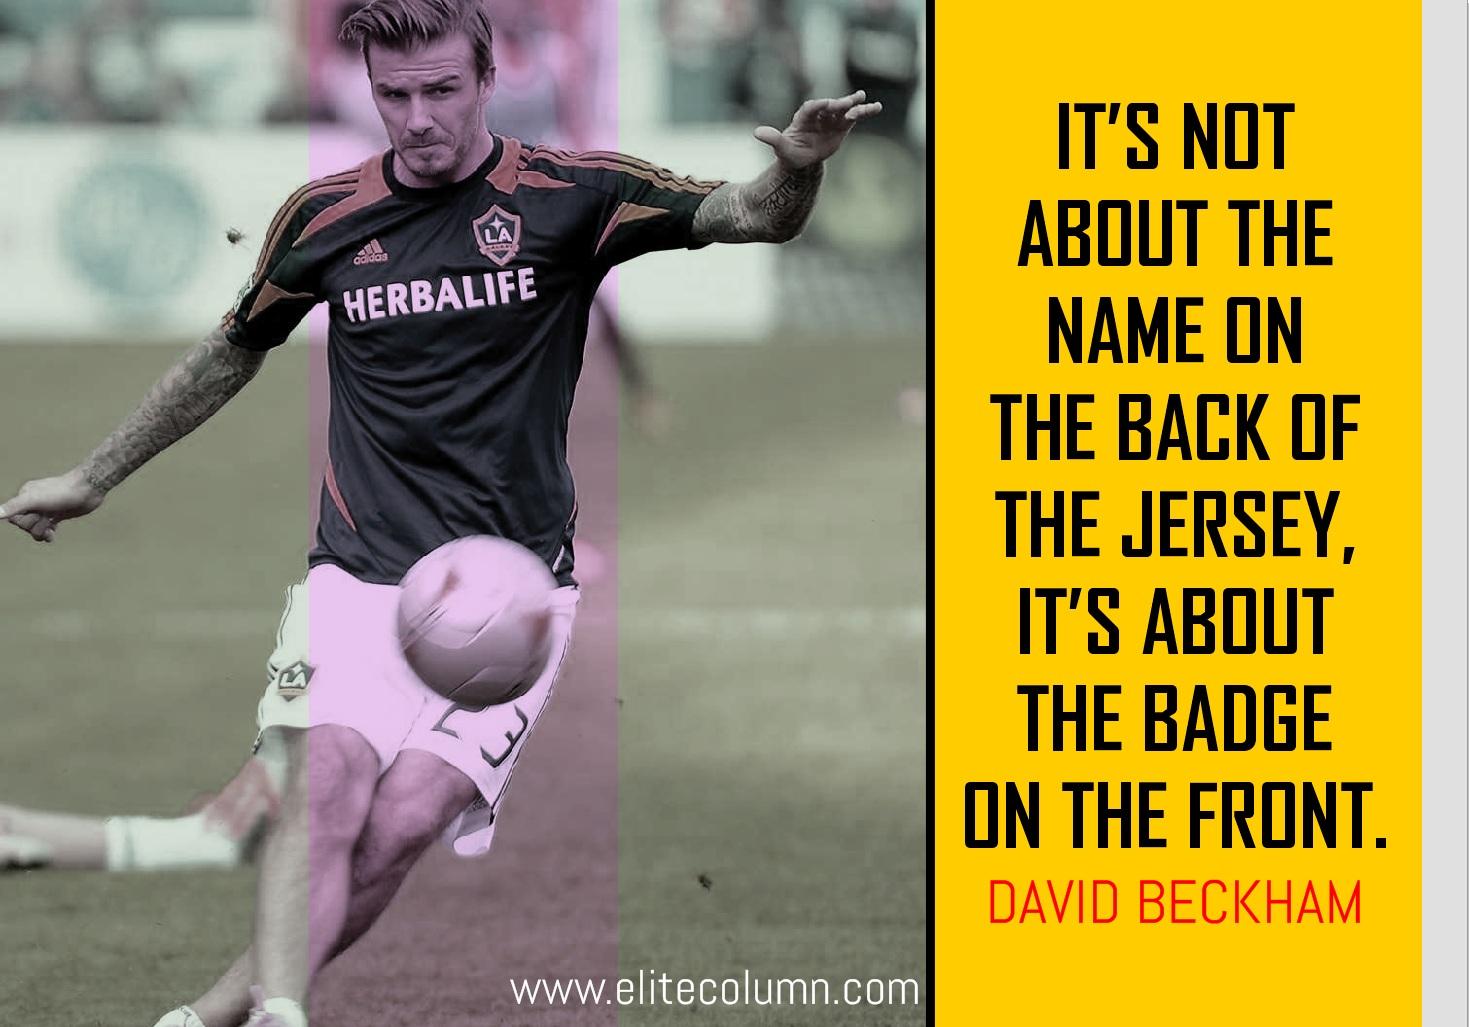 David Beckham Quotes 9 | EliteColumn